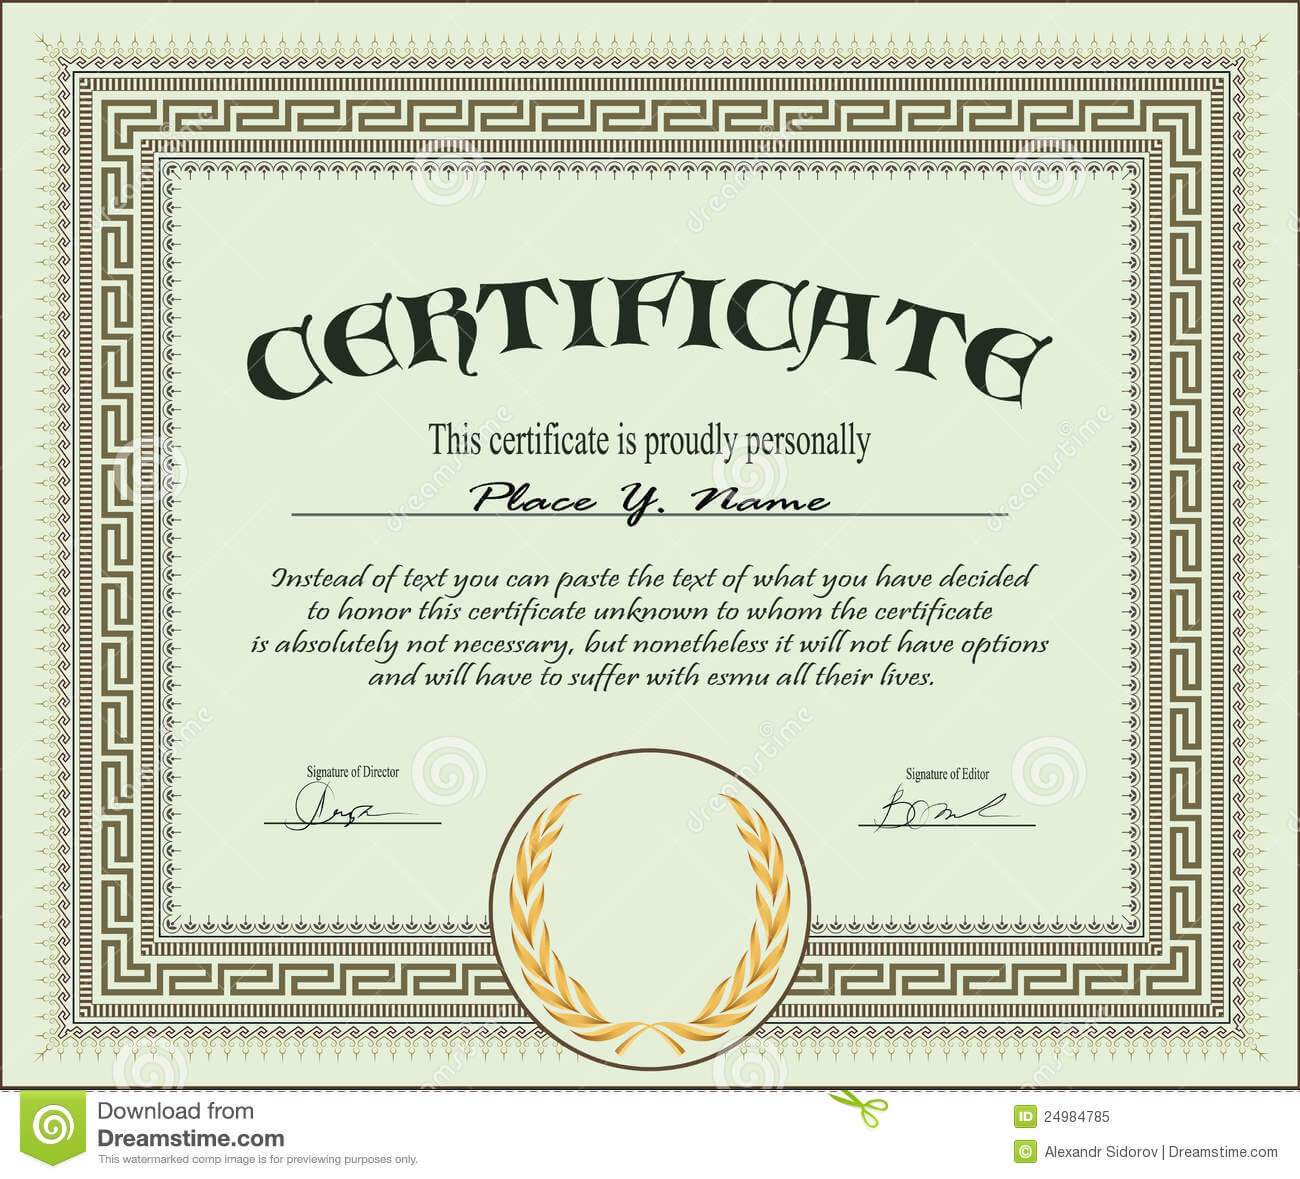 Certificate Template Stock Vector. Illustration Of With Regard To Free Stock Certificate Template Download